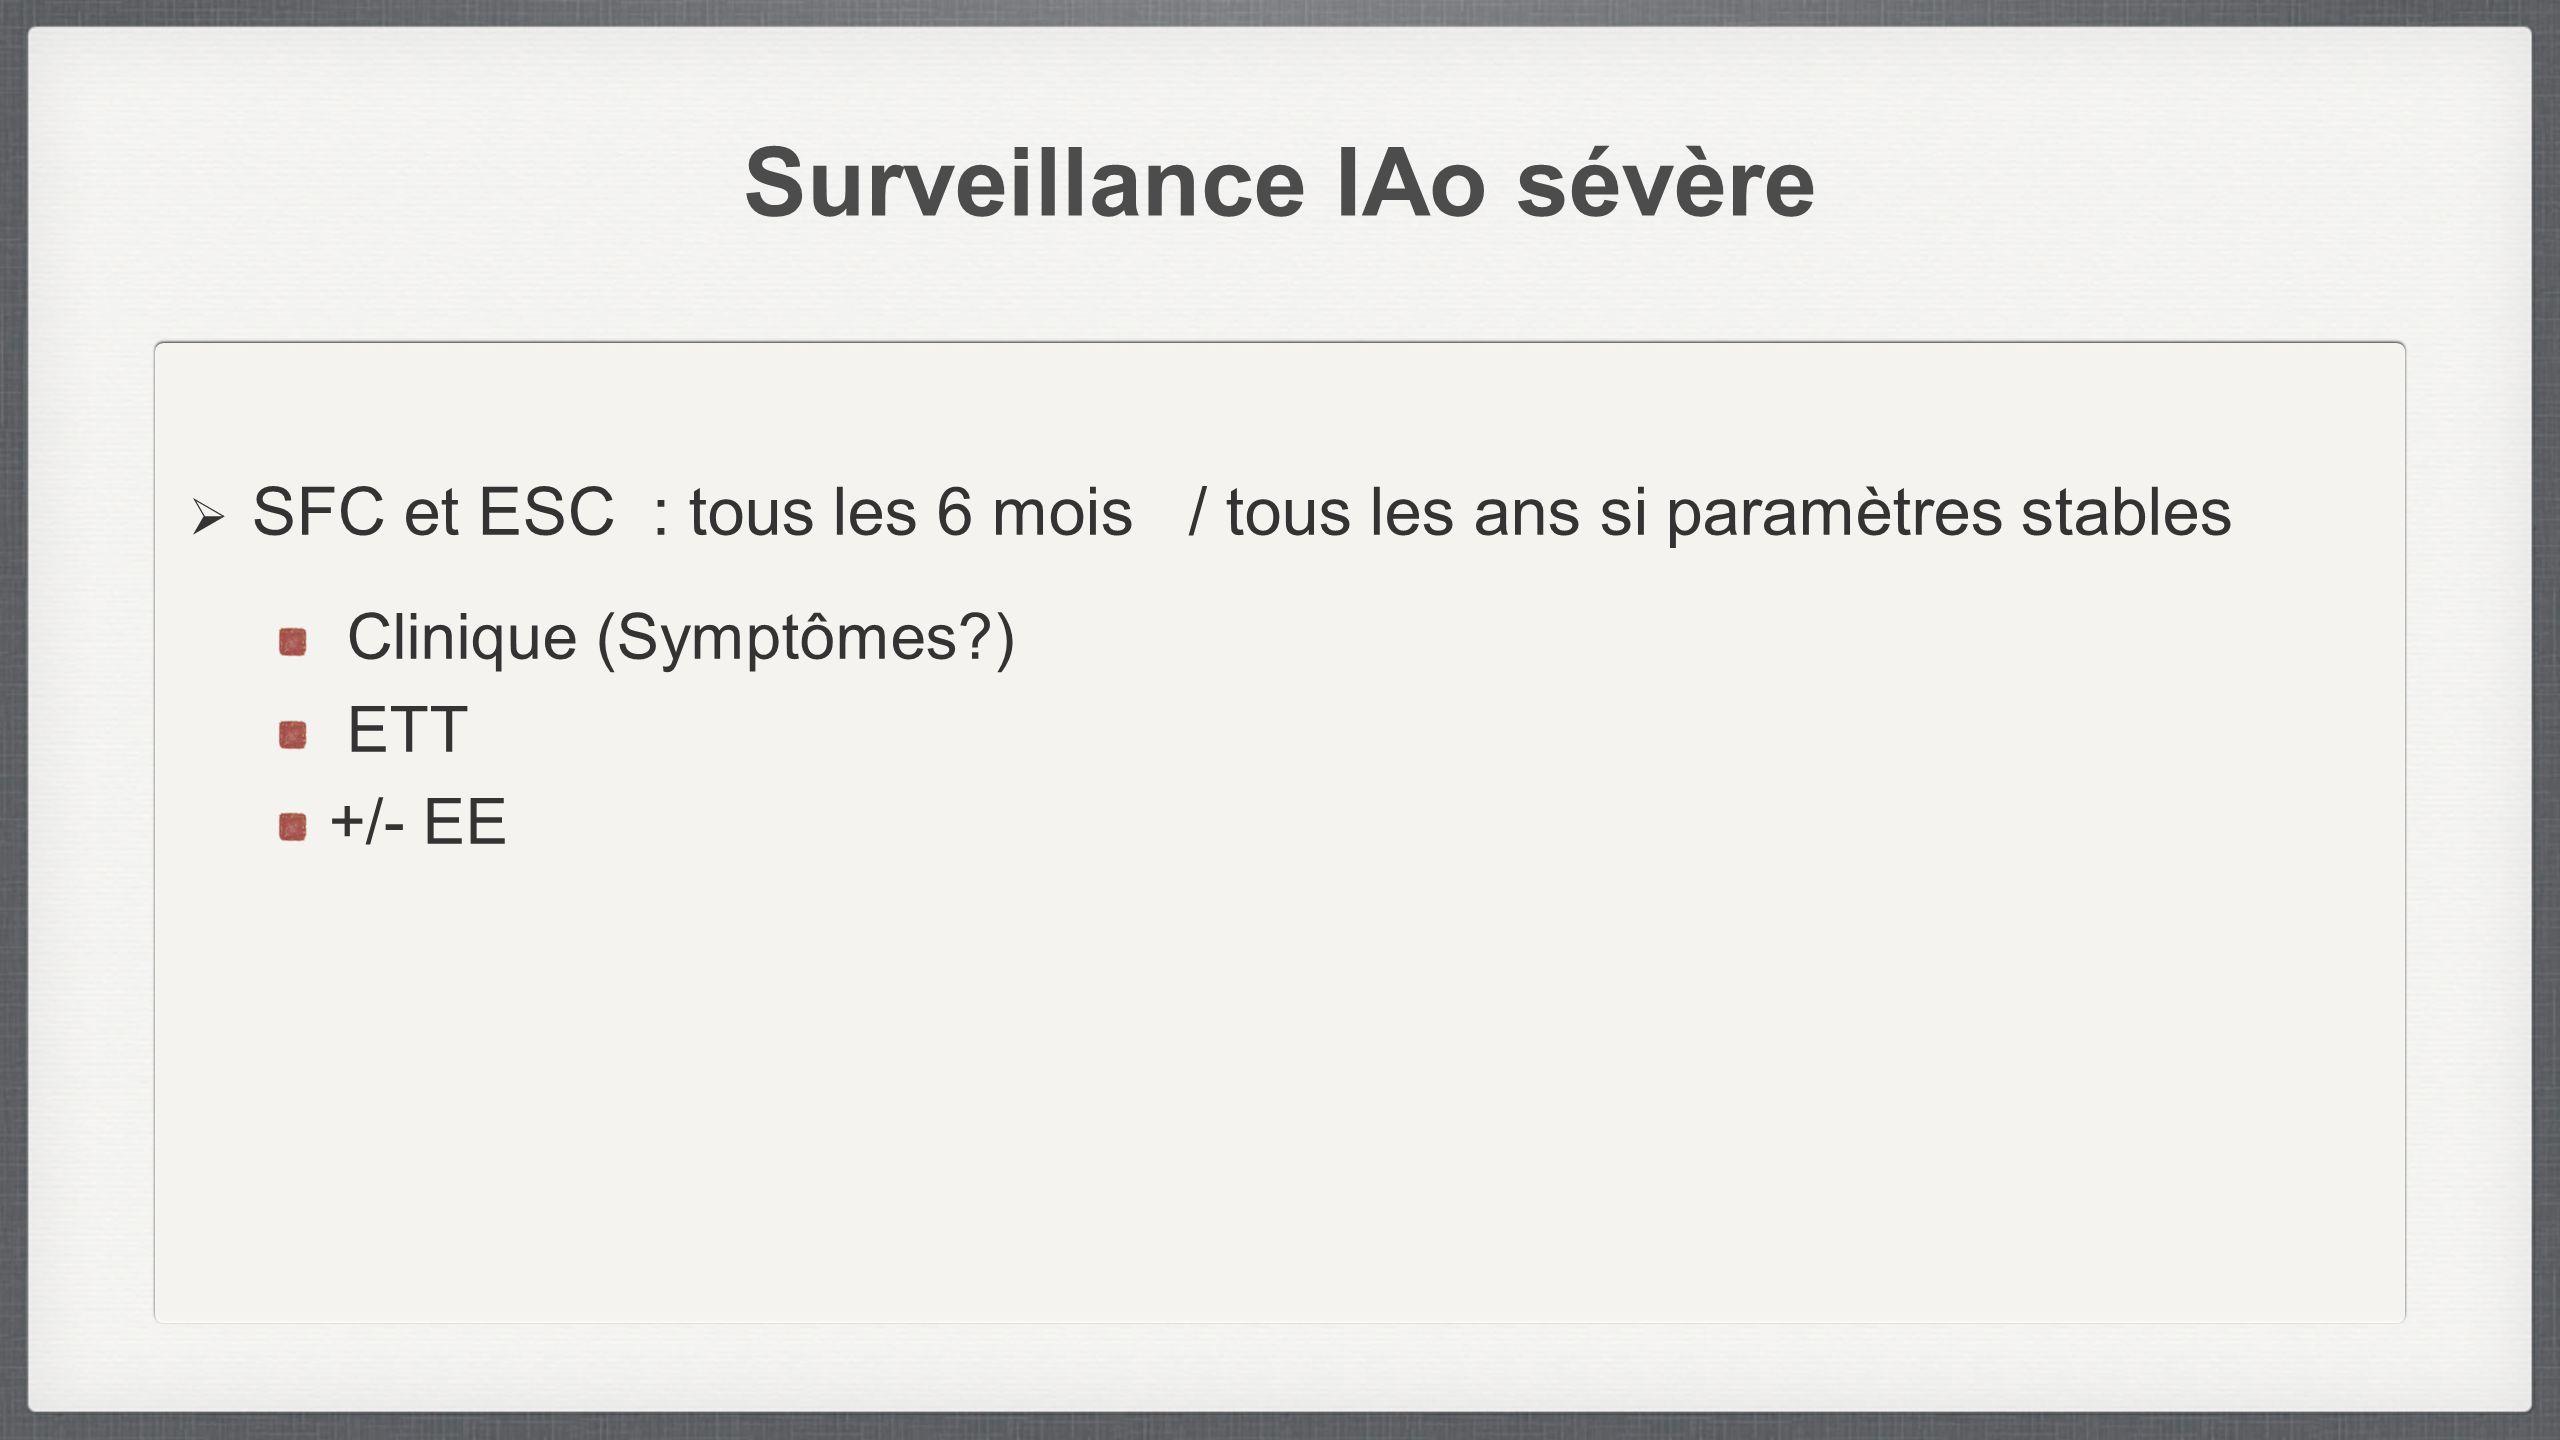 Surveillance IAo sévère